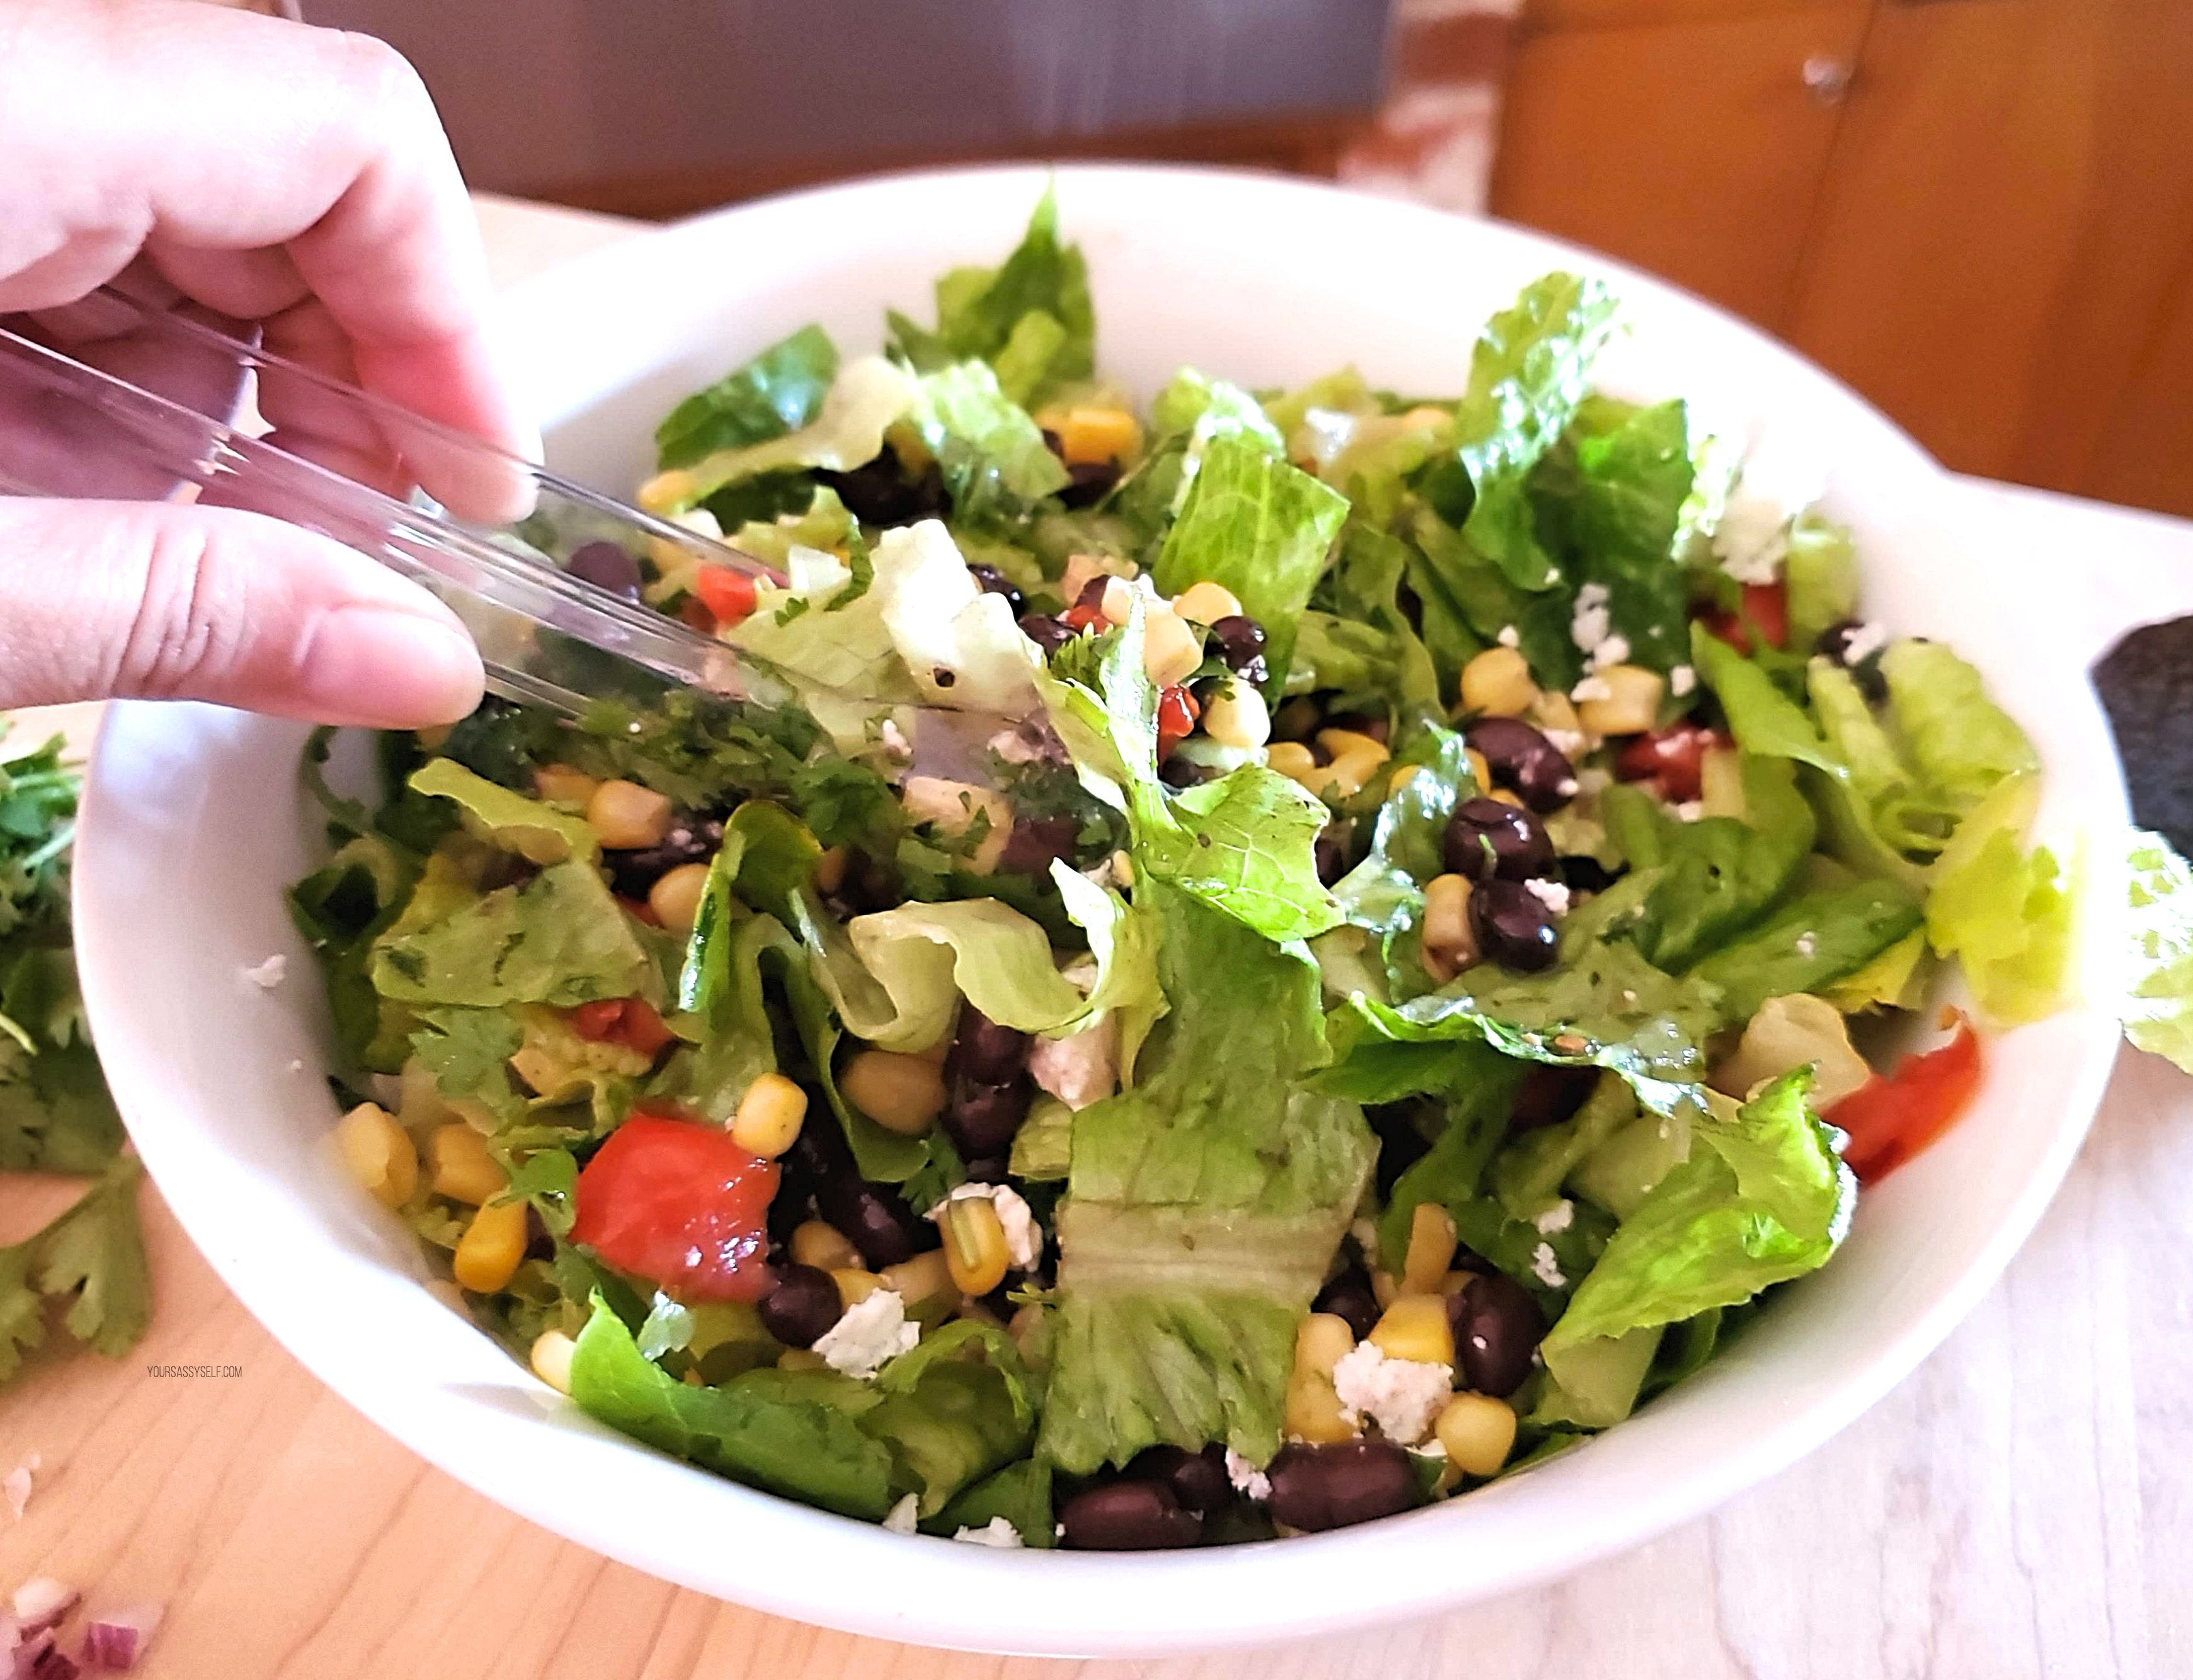 Tossing Salad - yoursassyself.com